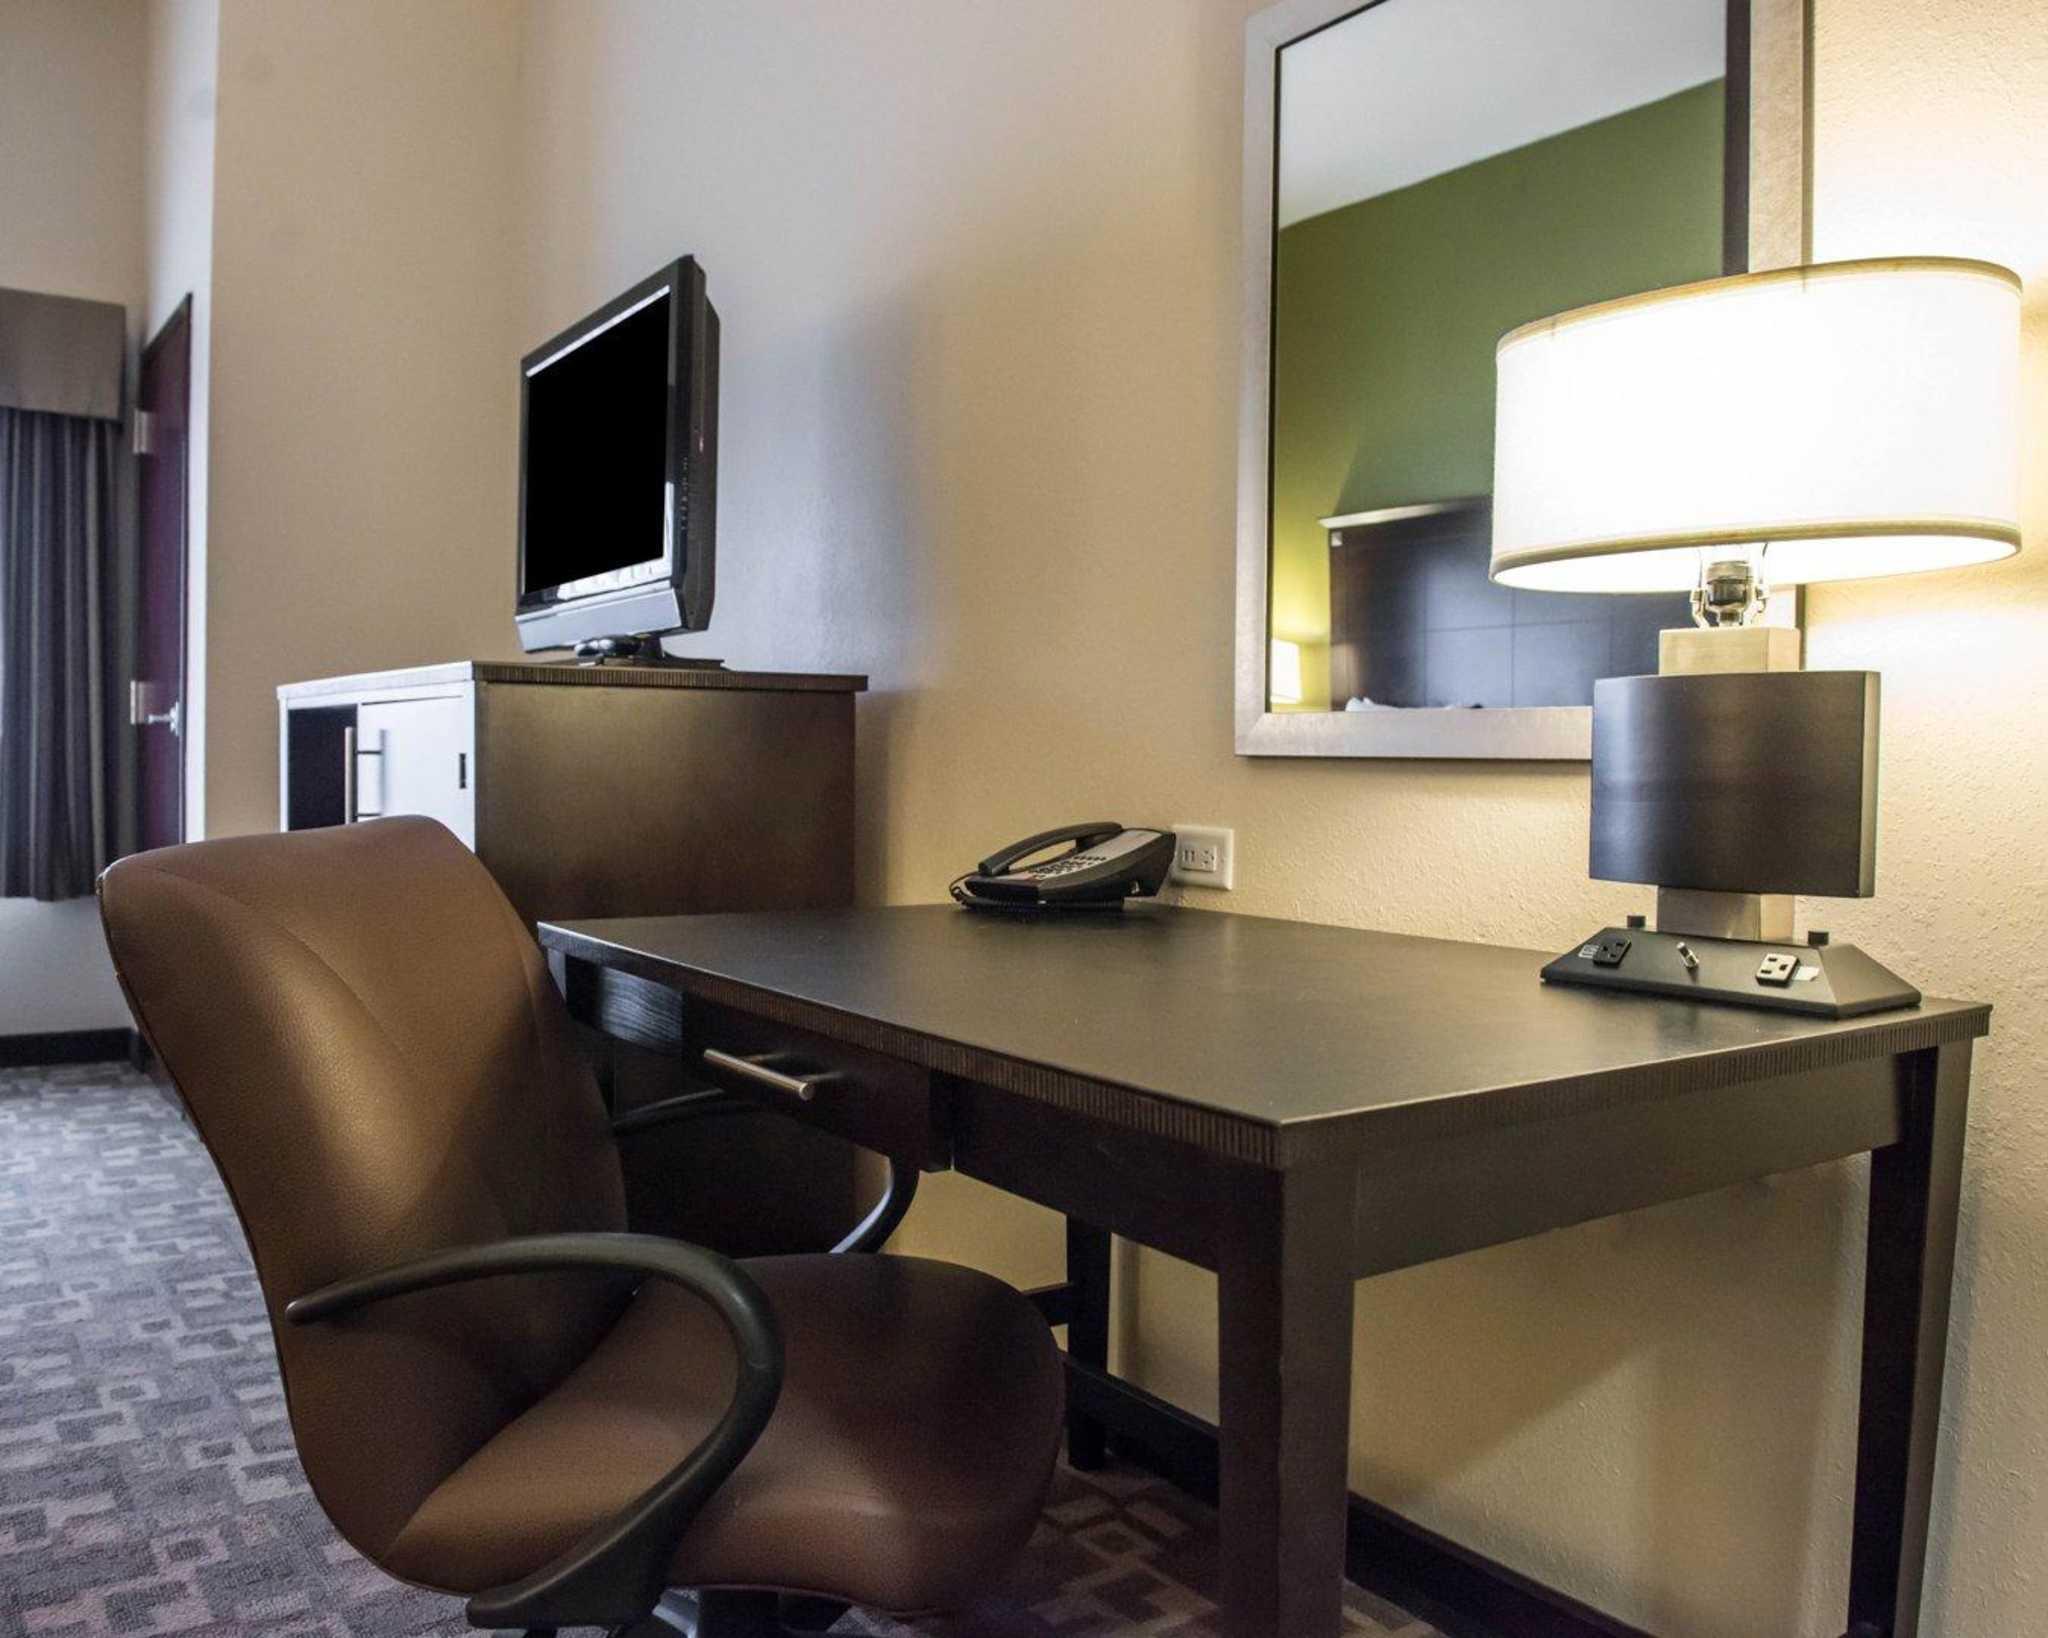 Comfort Suites image 5